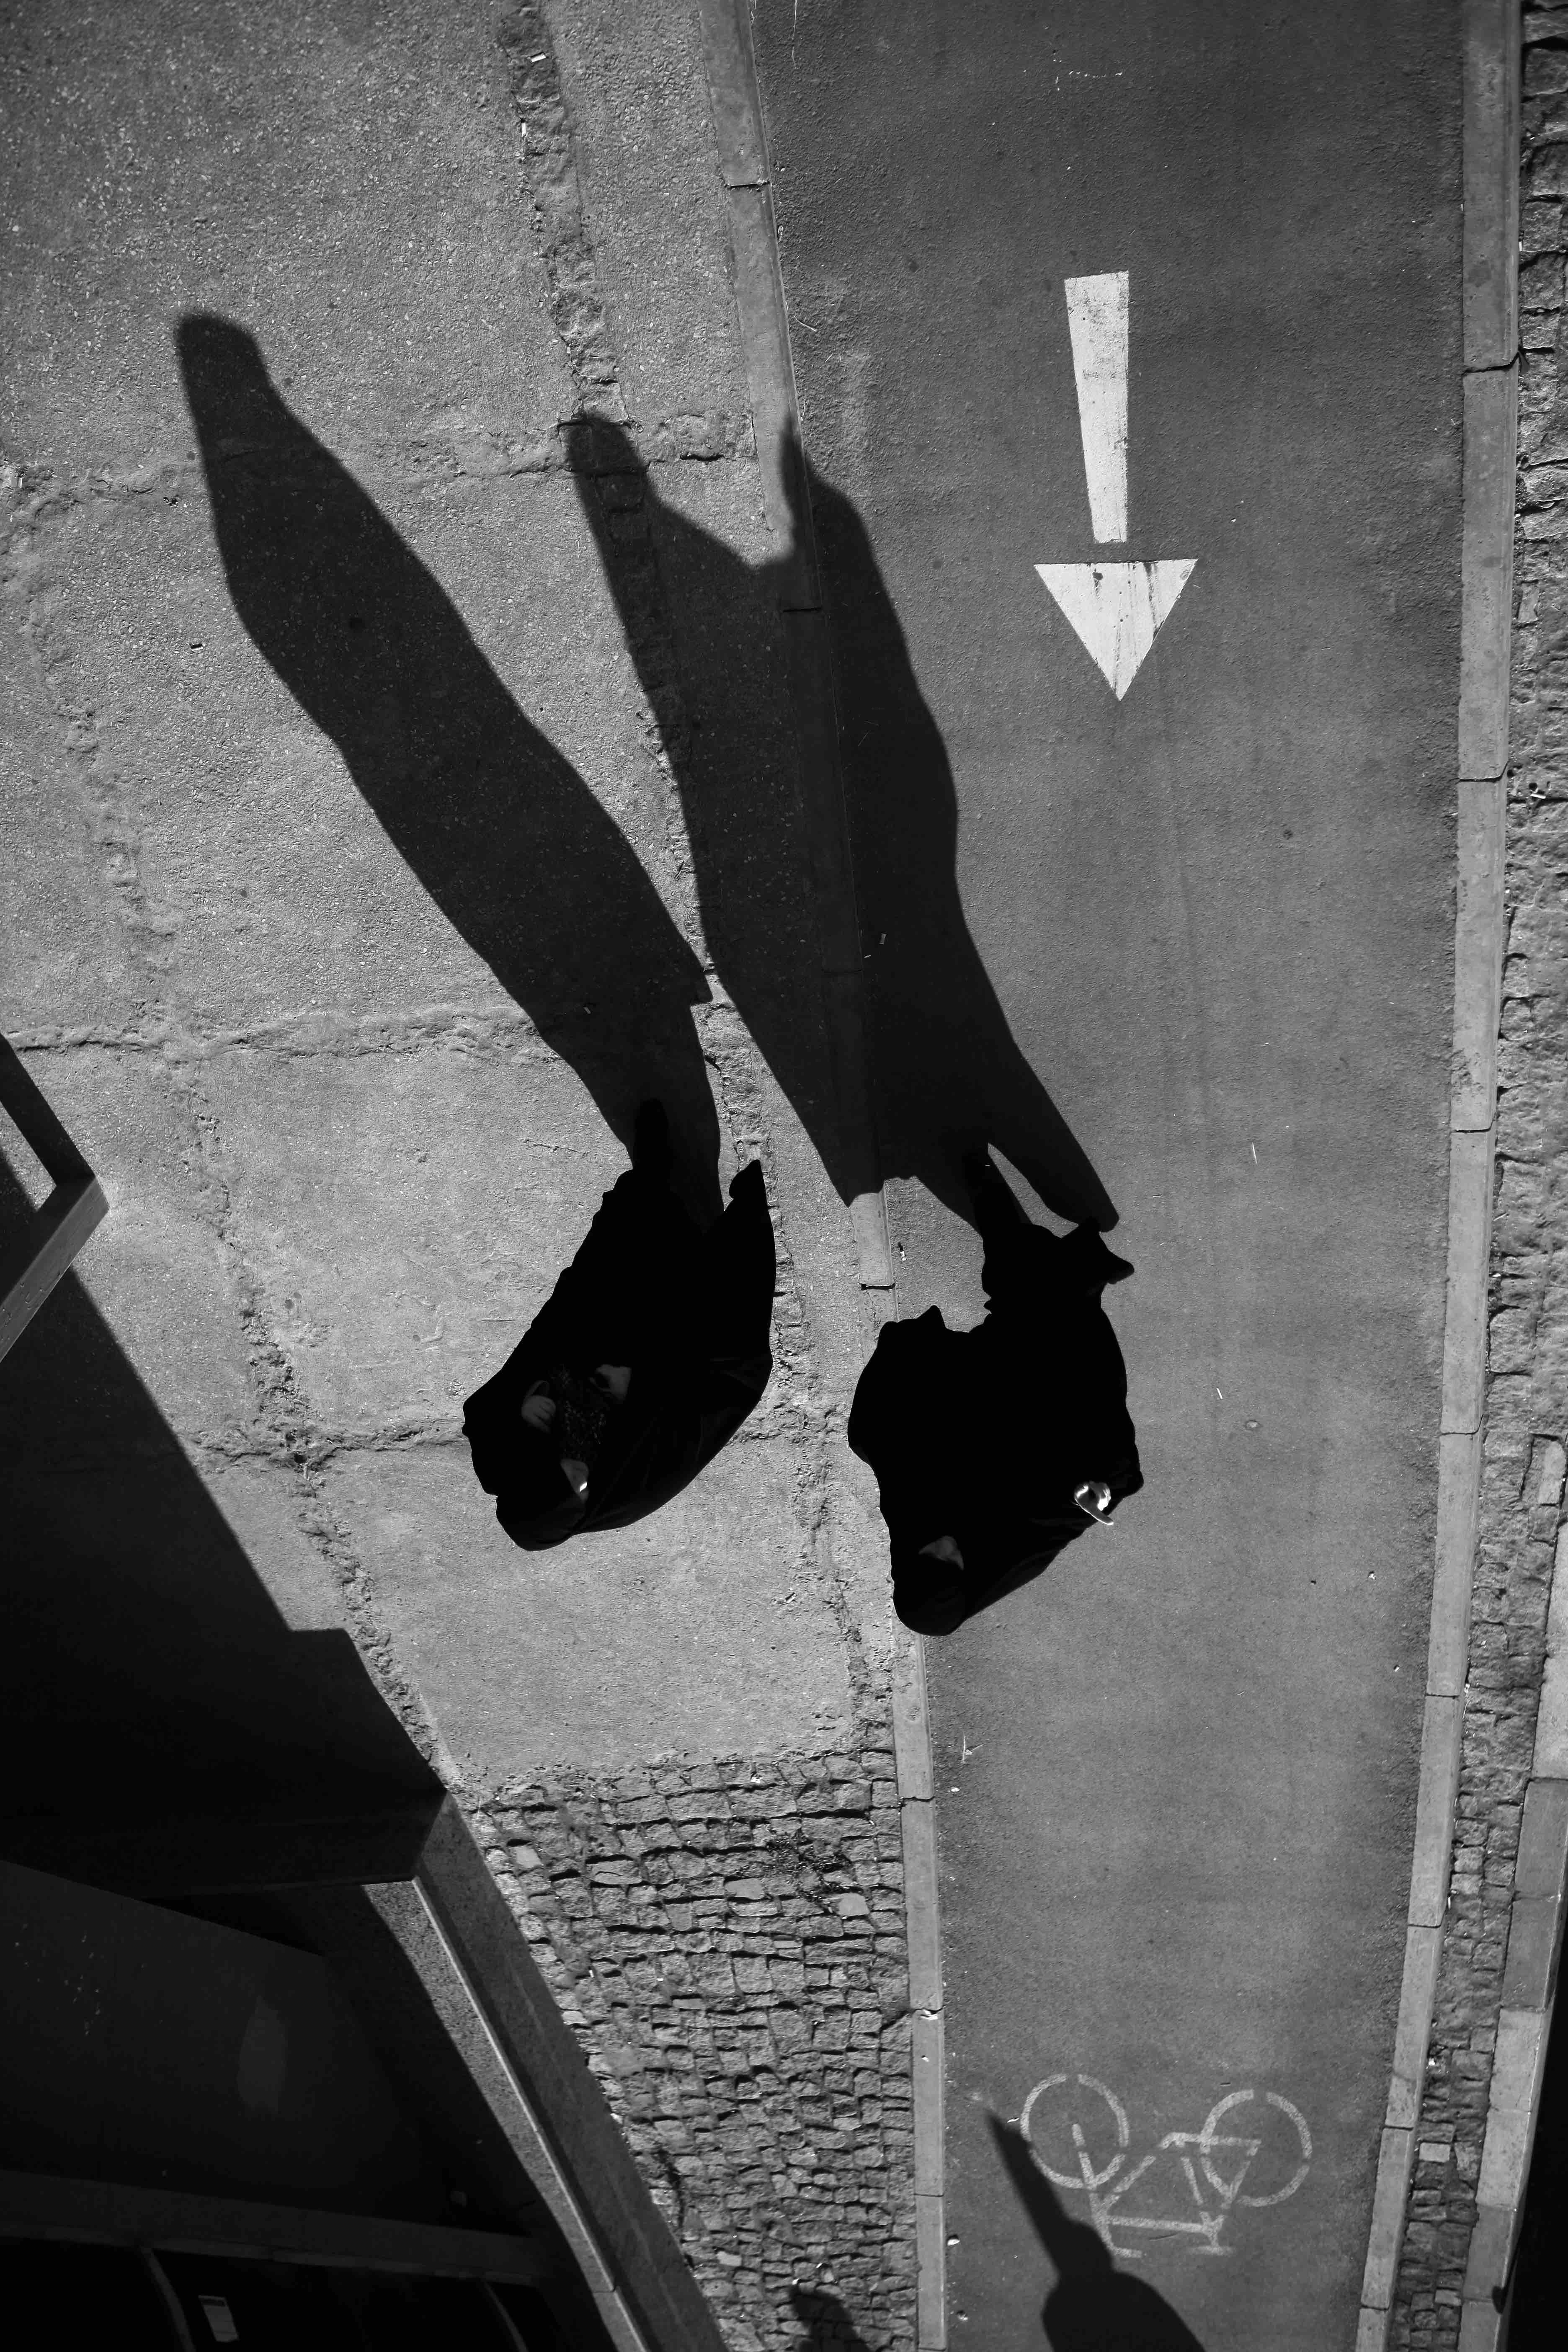 Untitled (25)_ The Life Of Shadows Series - Nehdaran_ Dana